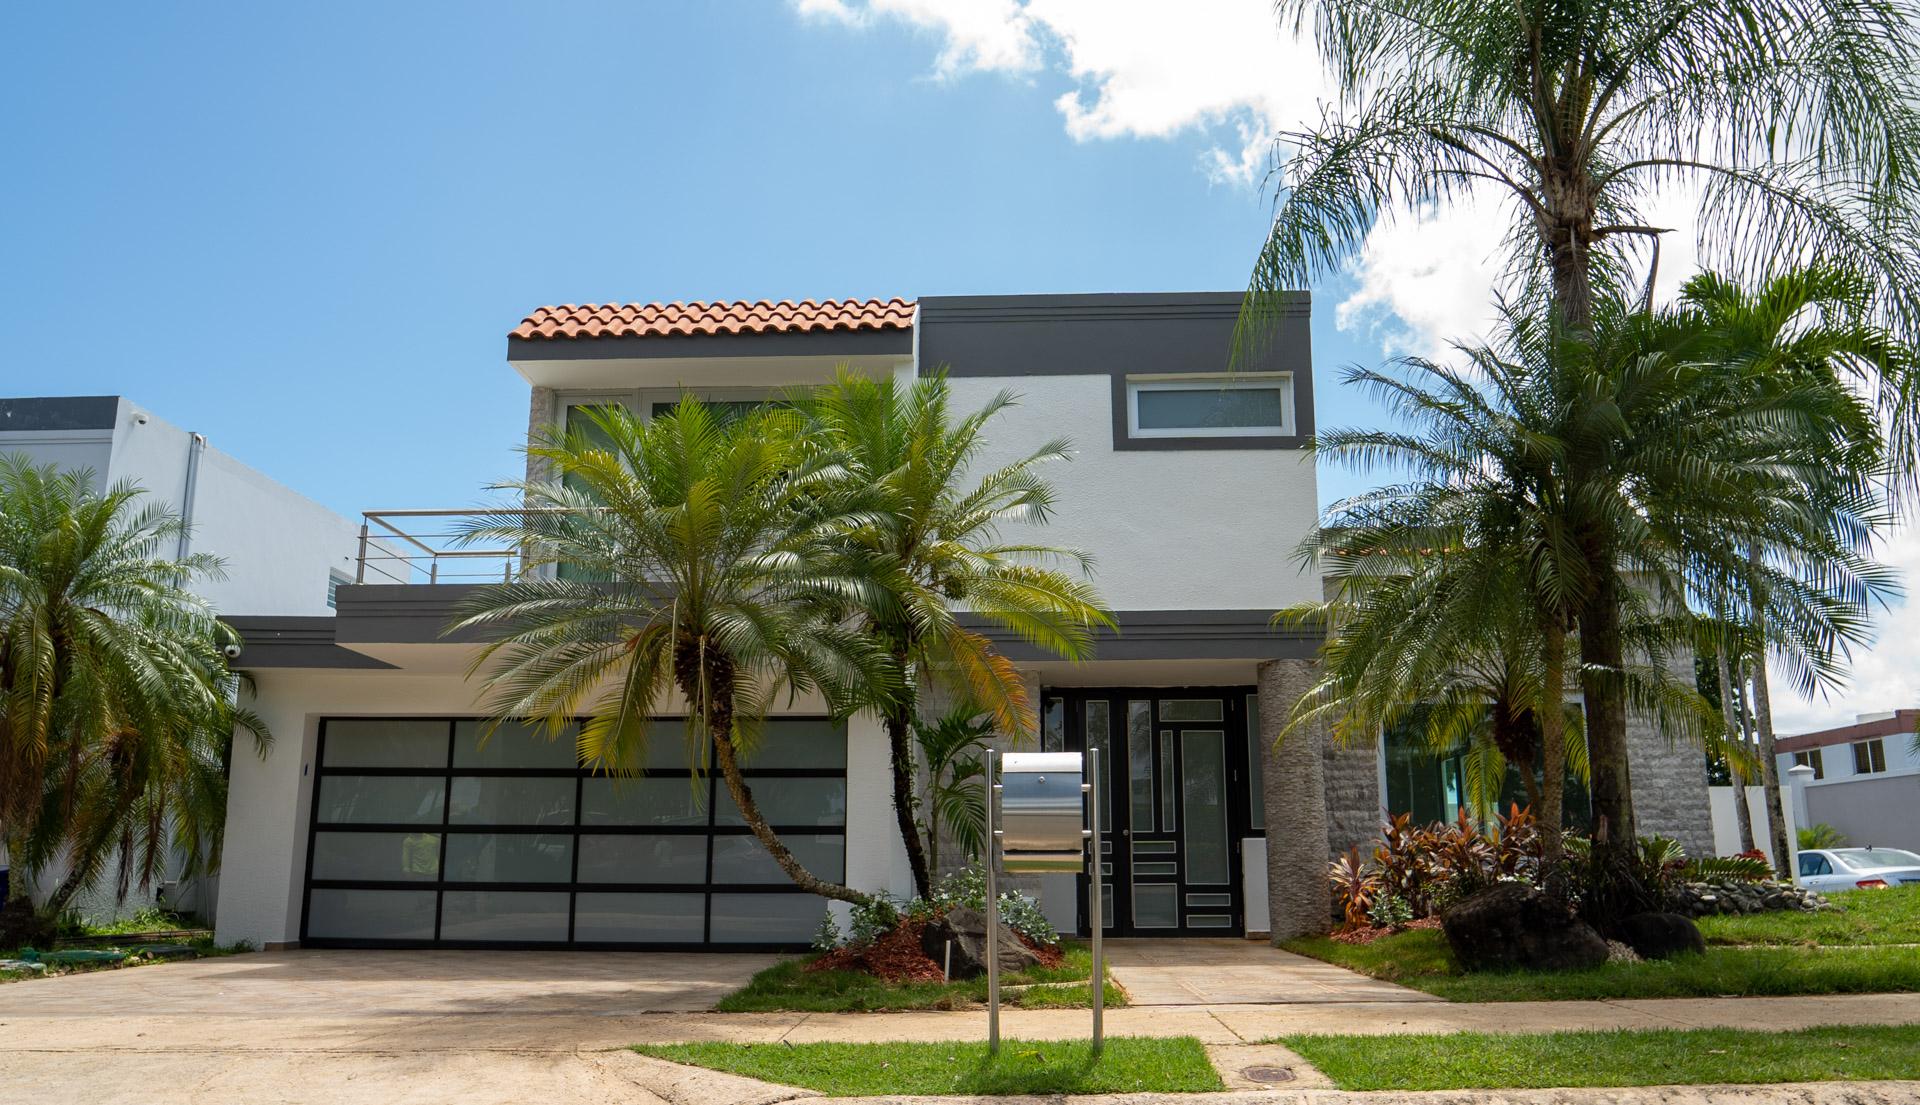 Urb. Palma Real – Magnificent Corner Home